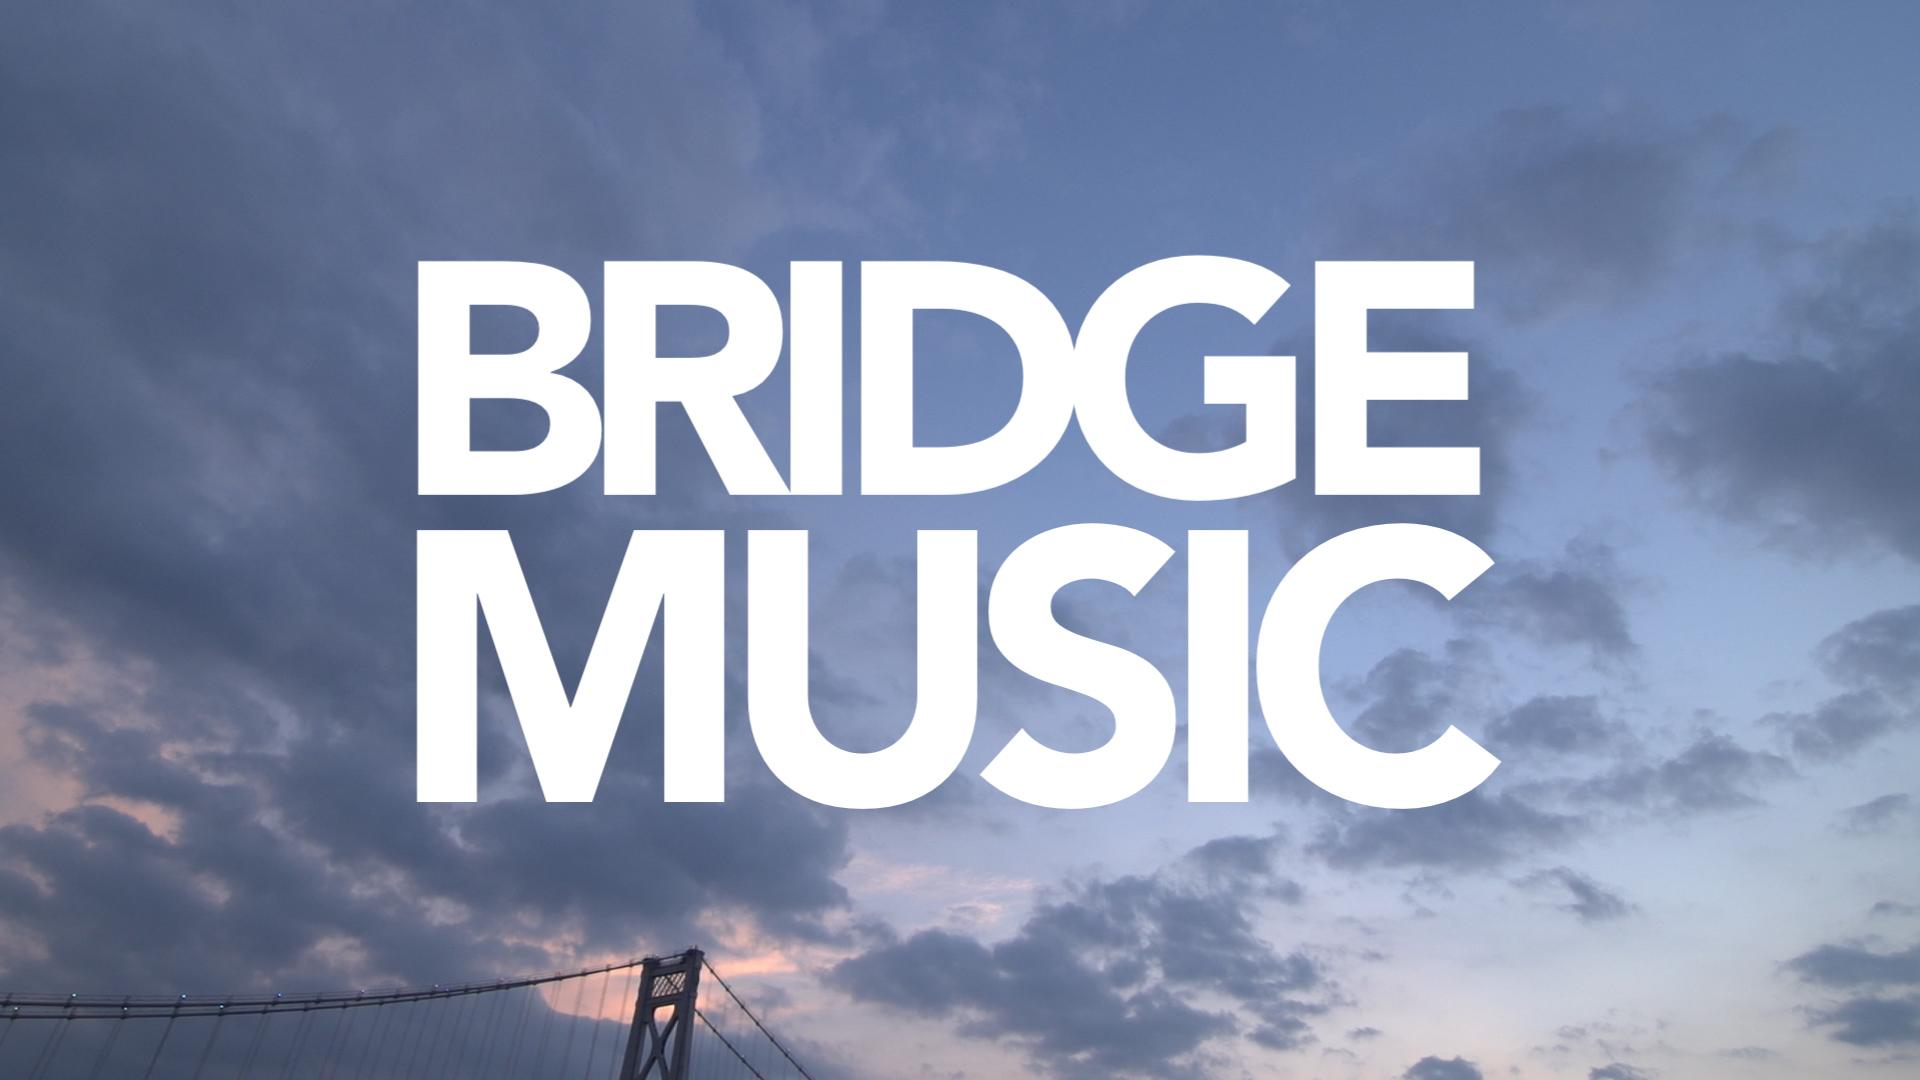 BridgeMusic_Master_updated.00_15_37_08.Still008.jpg